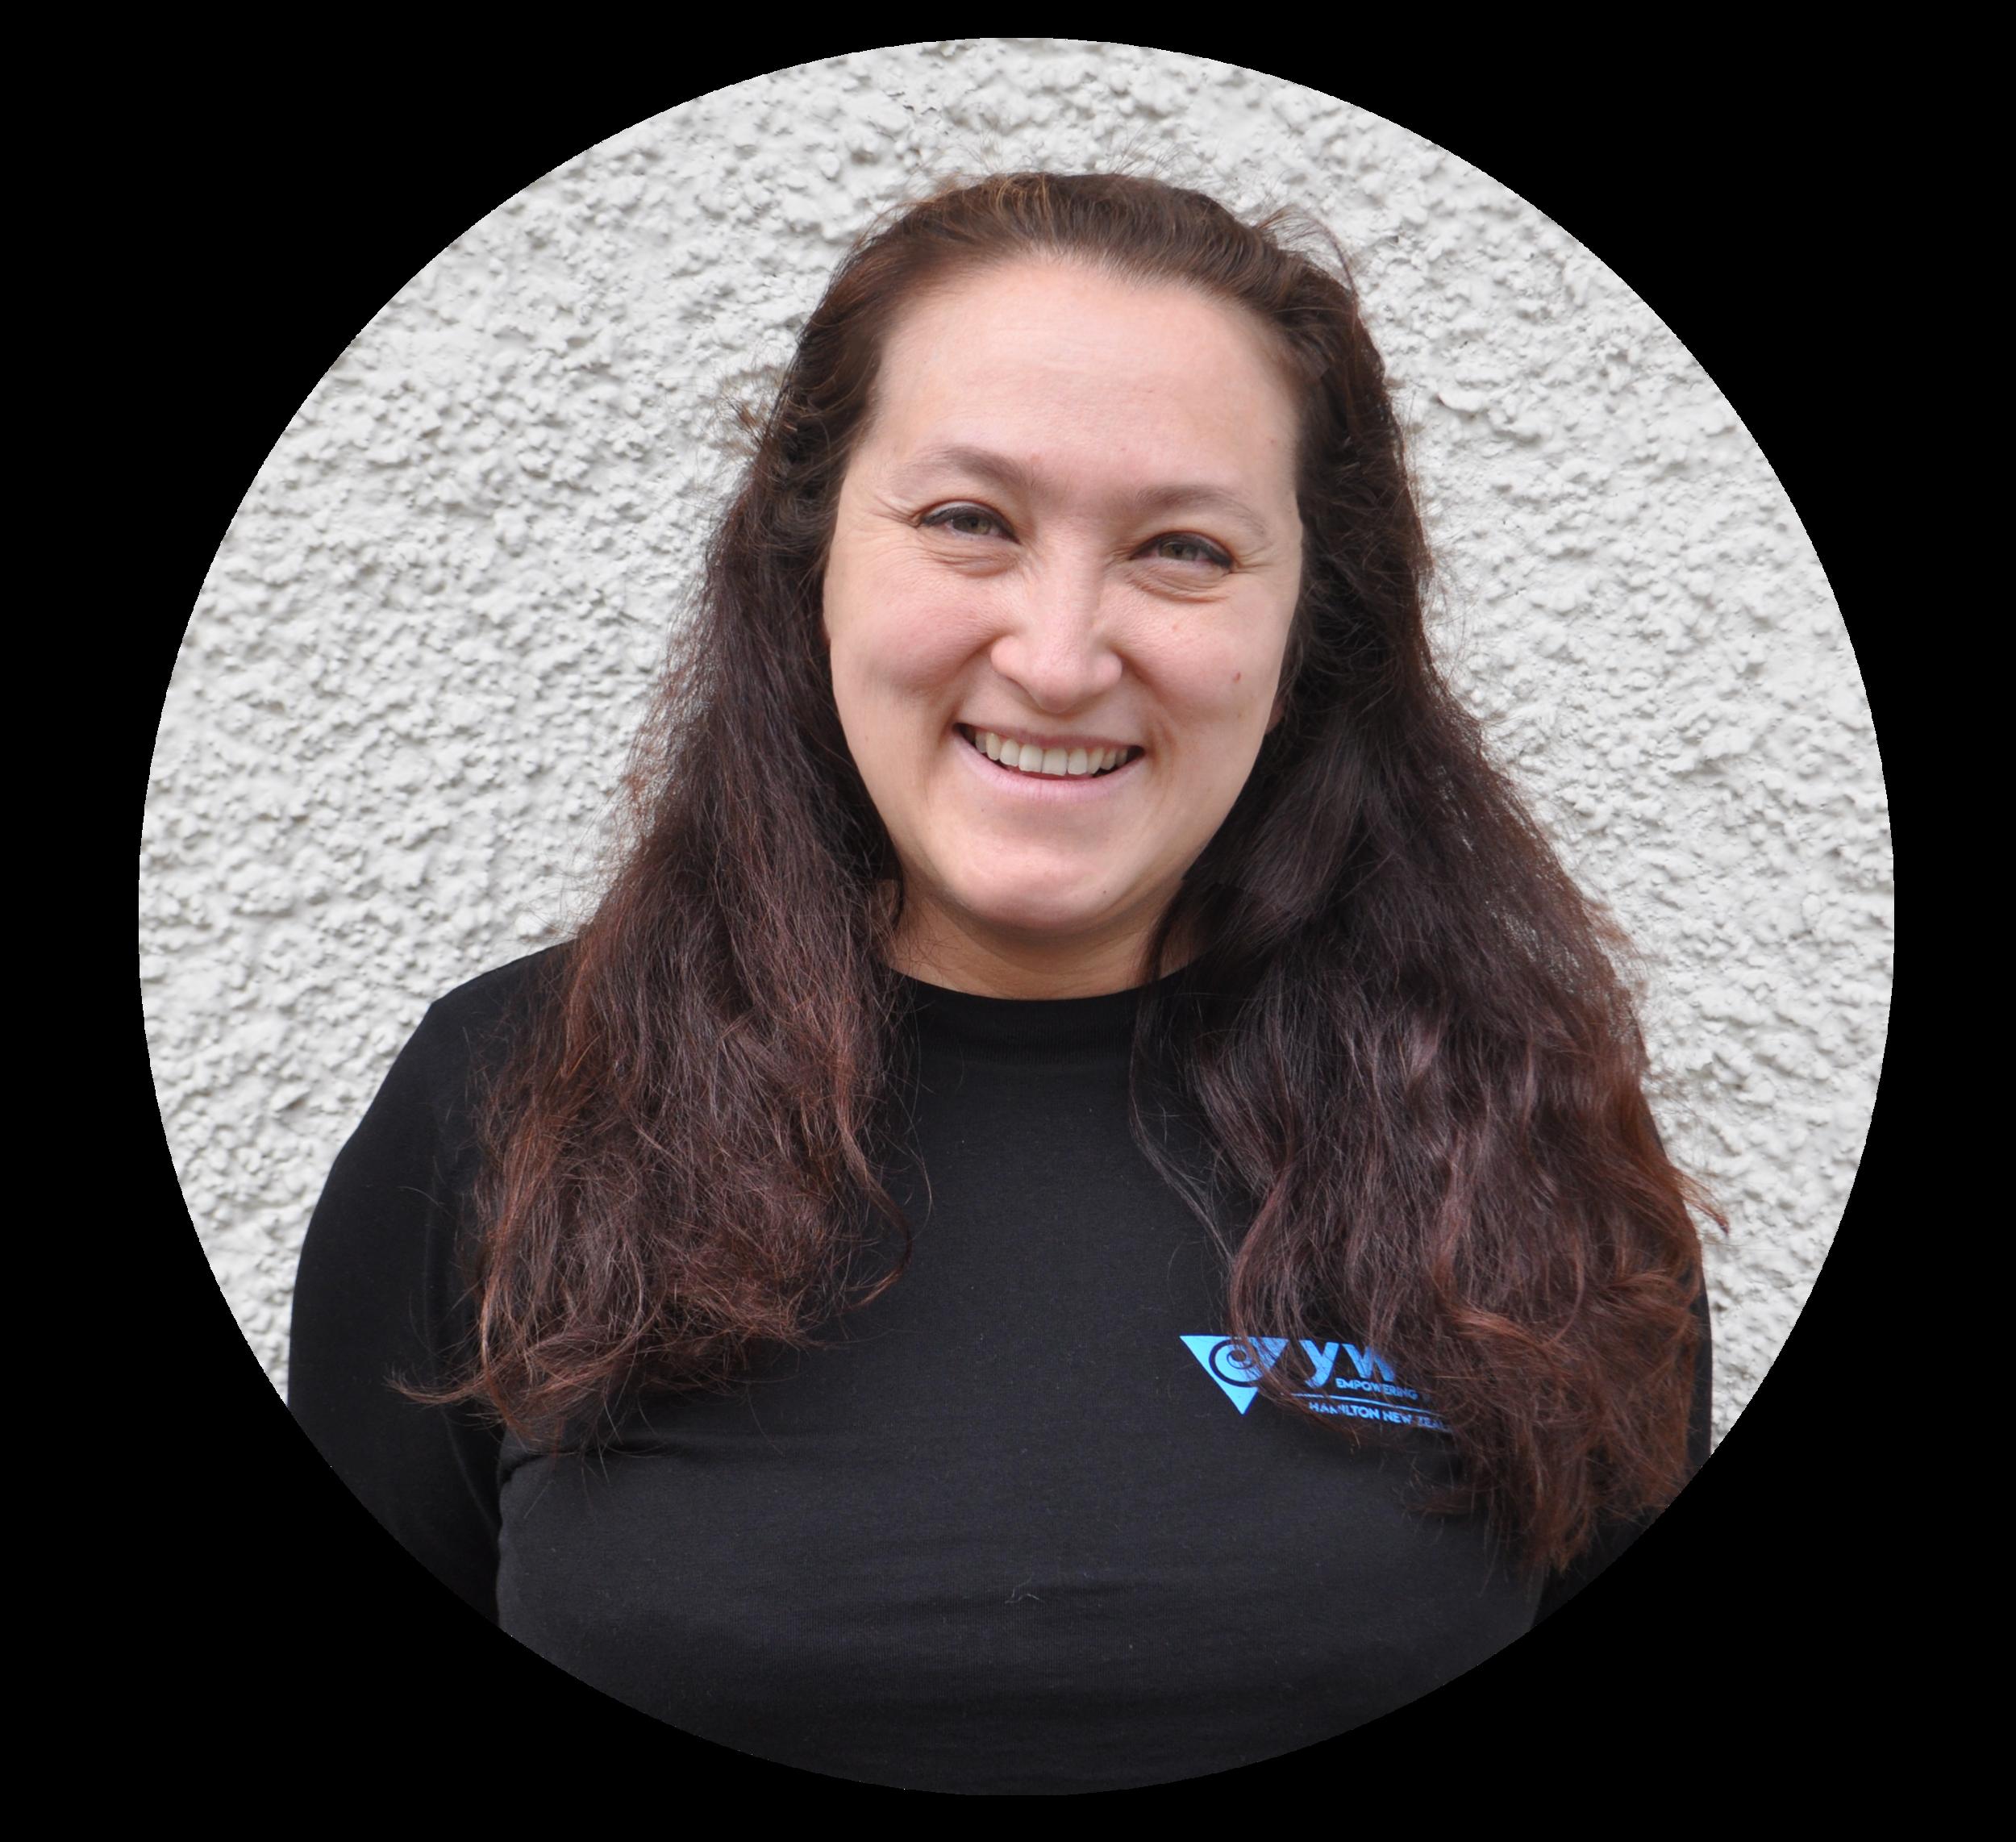 Svetlana Twizell - Business Administratoradmin@ywcahamilton.org.nz